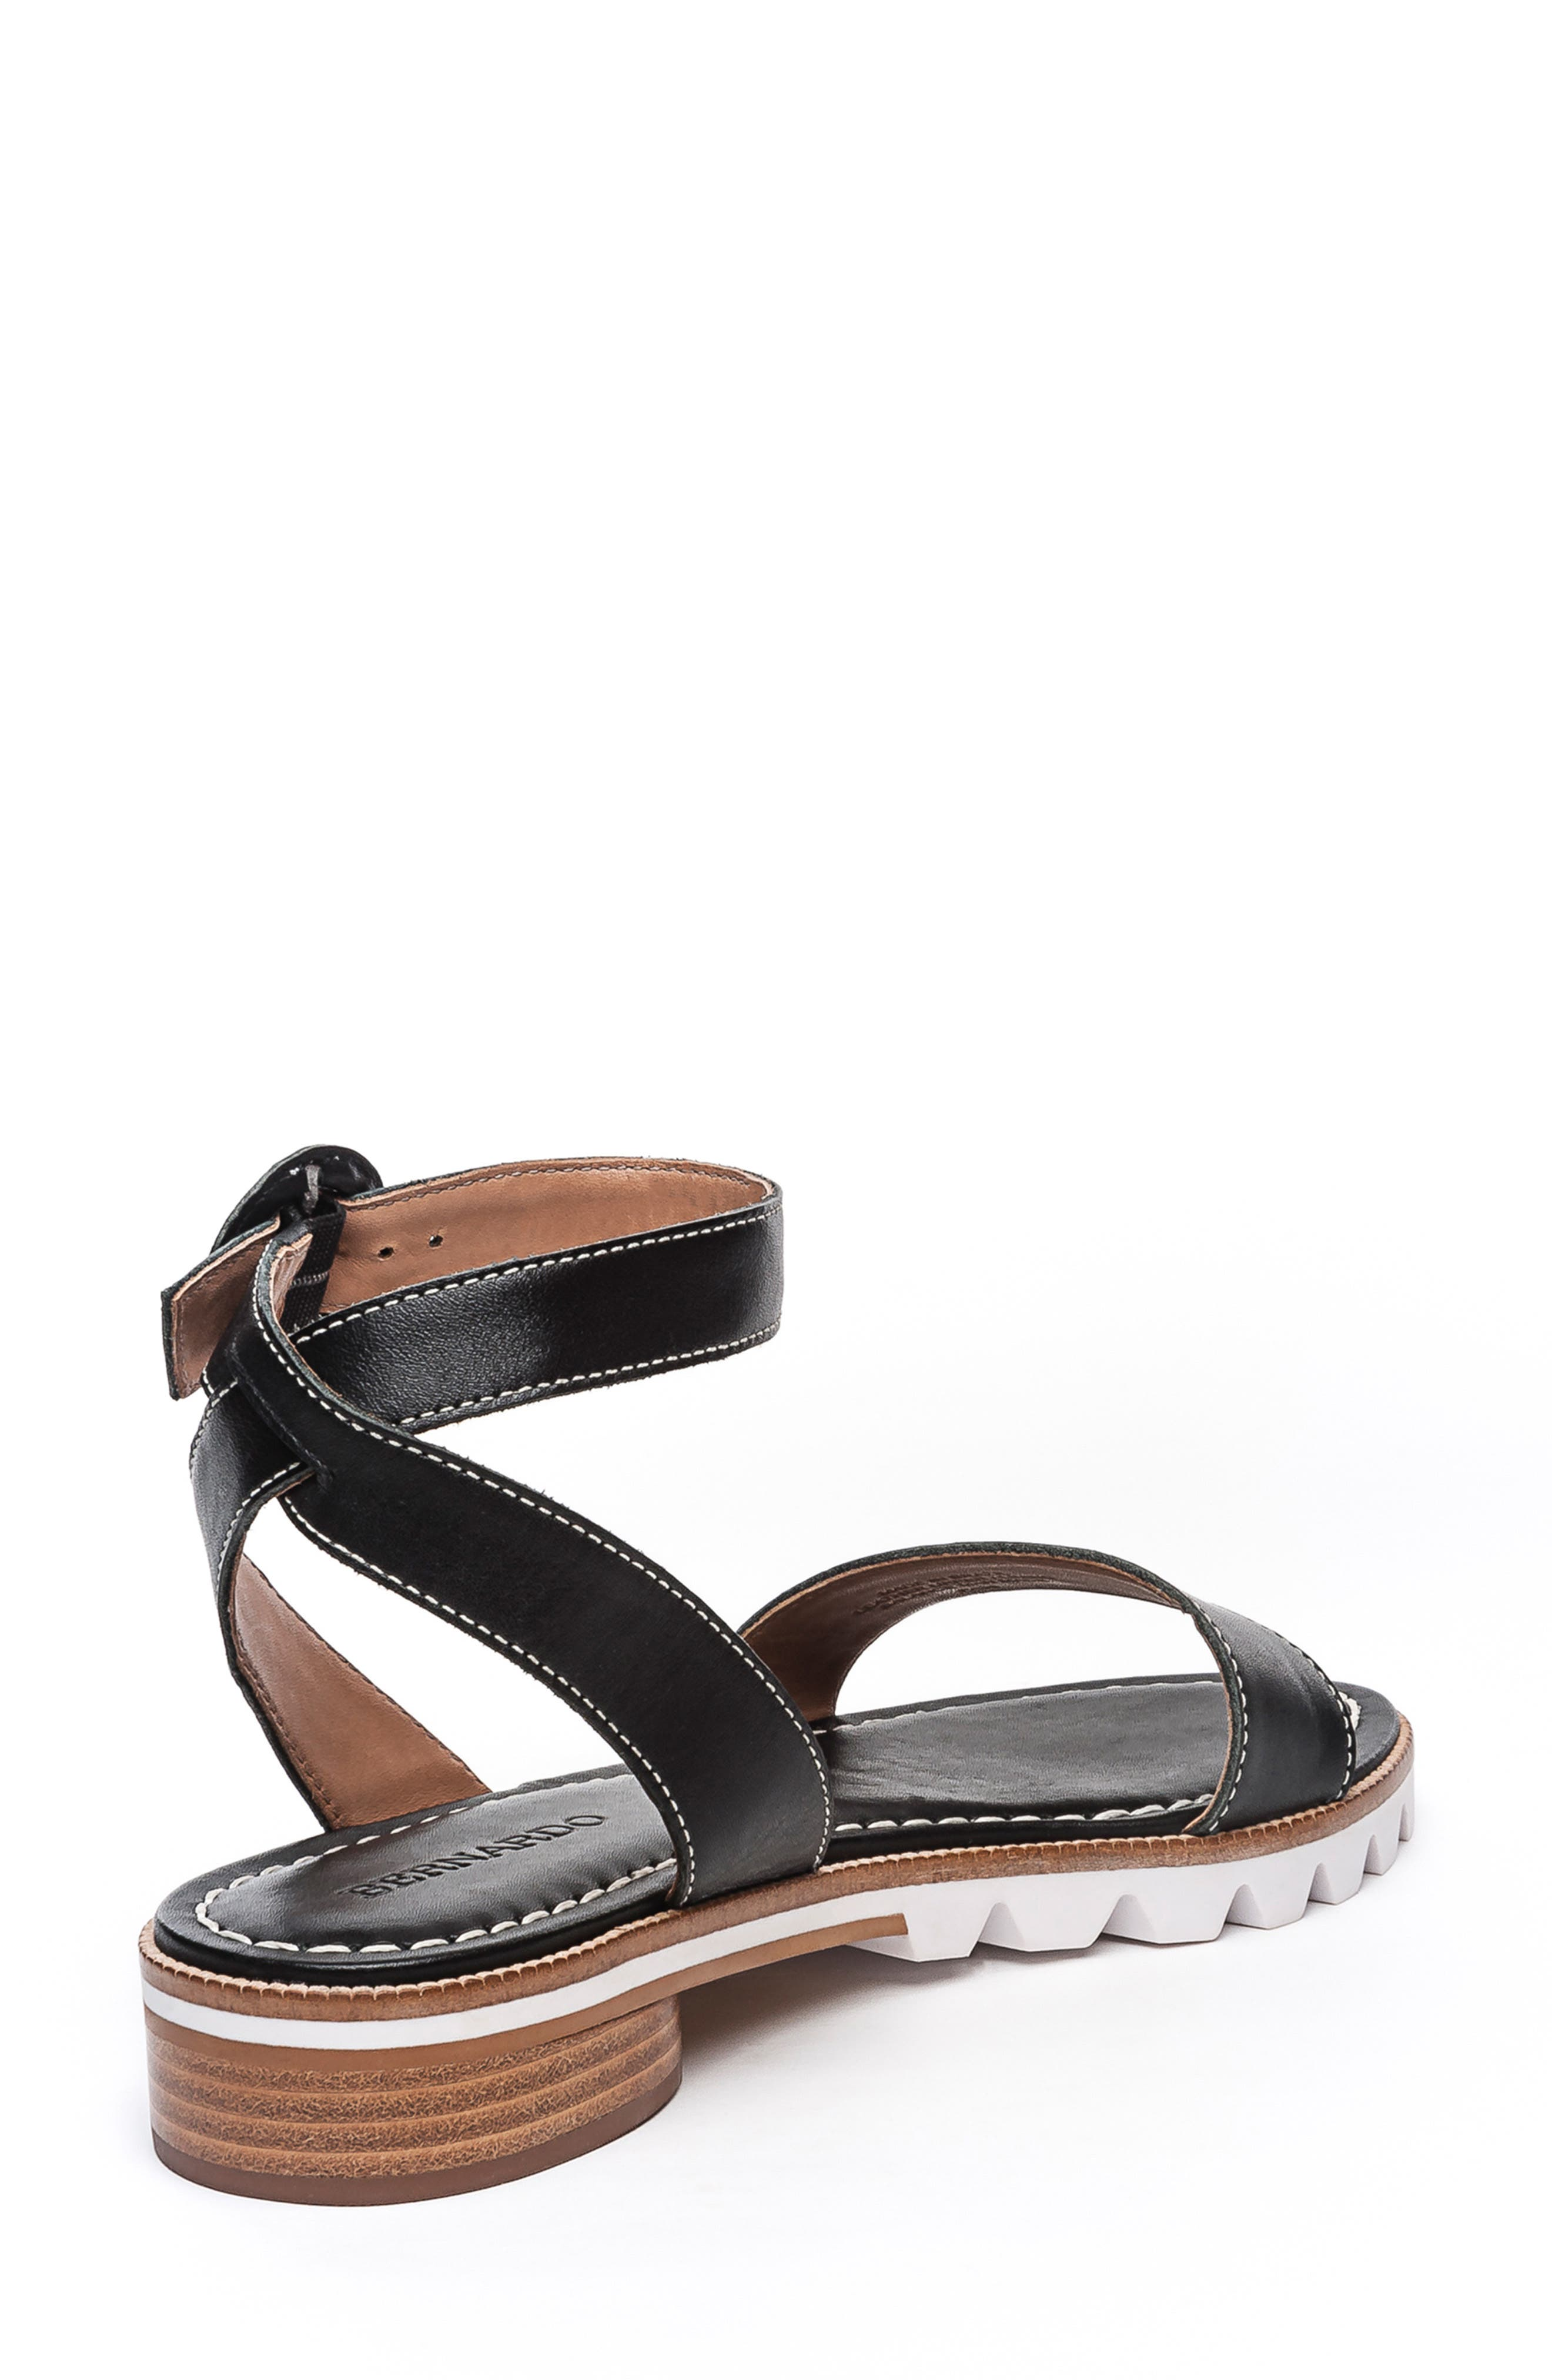 BERNARDO, Footwear Alexis Ankle Strap Sandal, Alternate thumbnail 2, color, BLACK